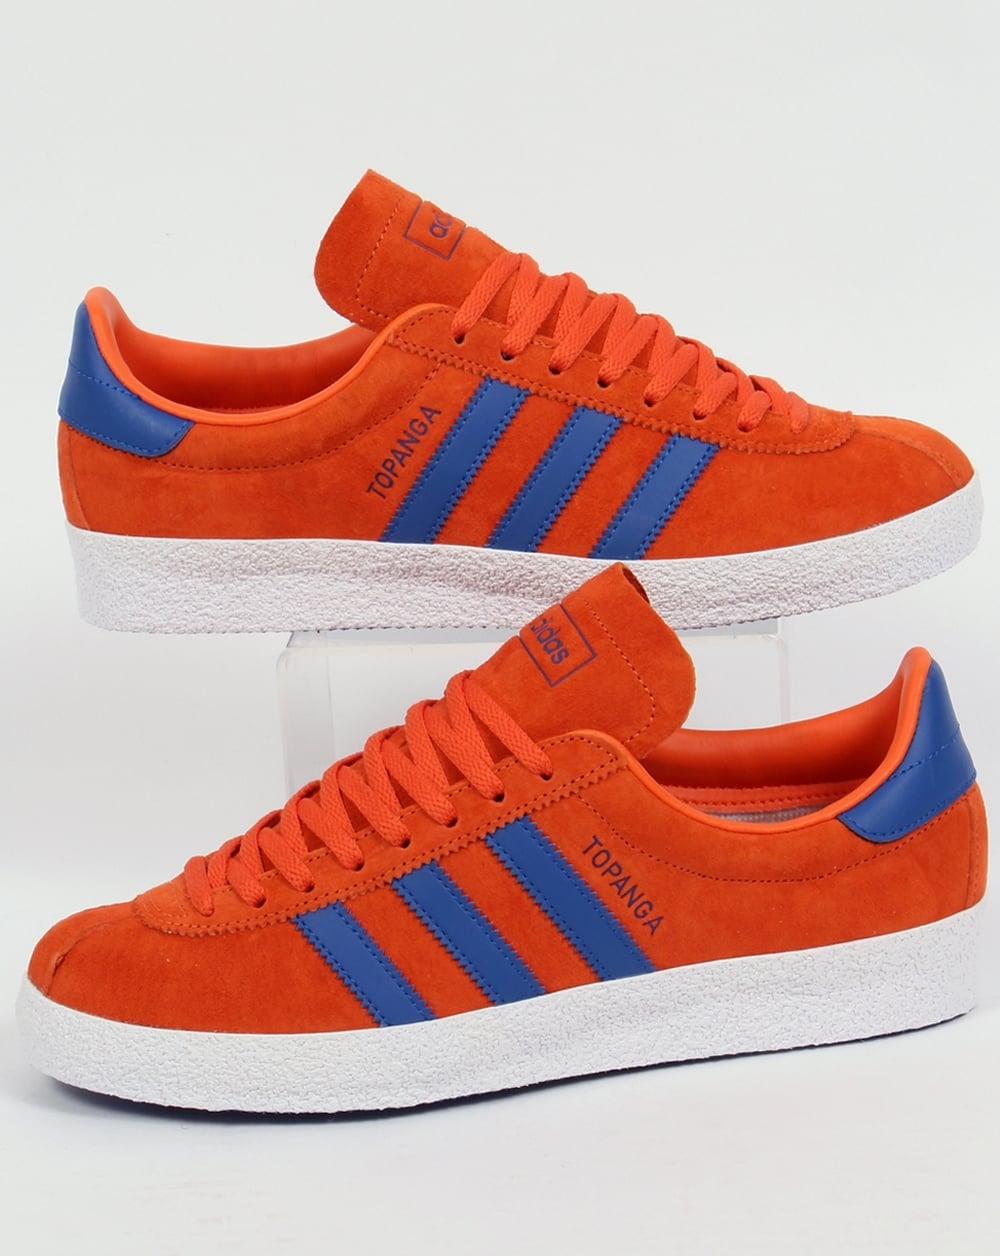 Adidas Topanga Trainers Craft Orange